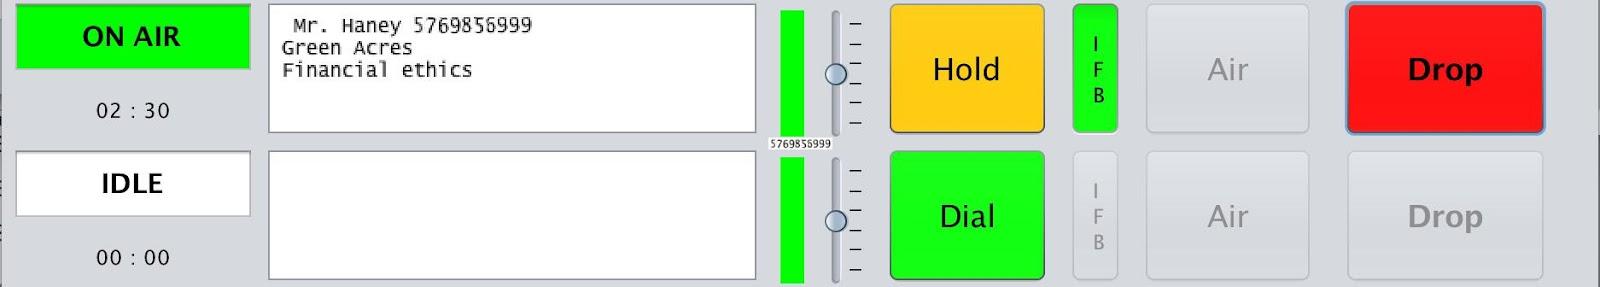 :Backbone Talk Docs Images:Put Haney on Air 206.jpg